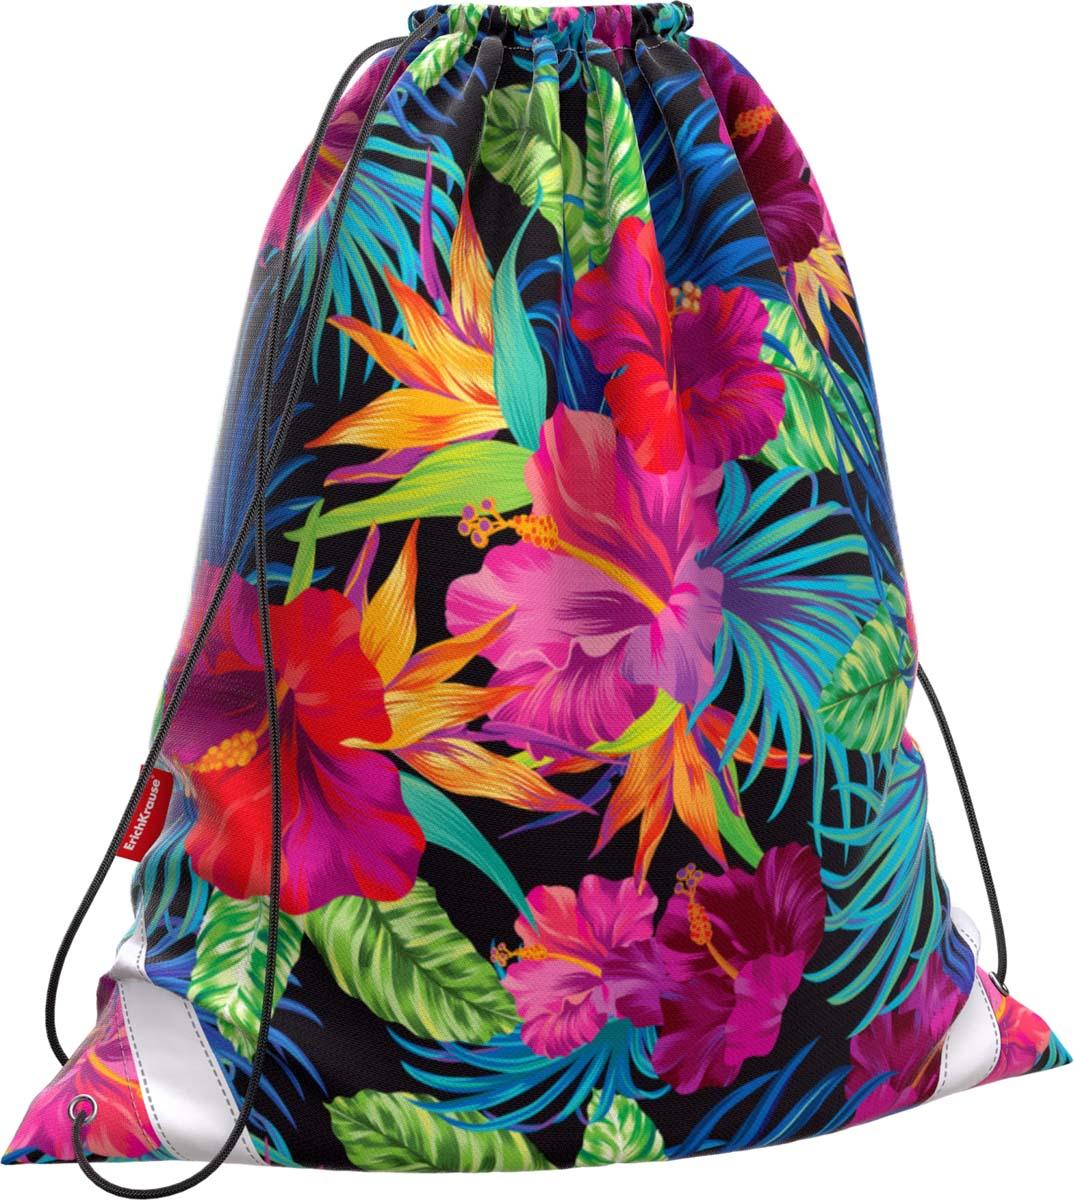 Erich Krause Сумка для сменной обуви Flowers 44743 цена